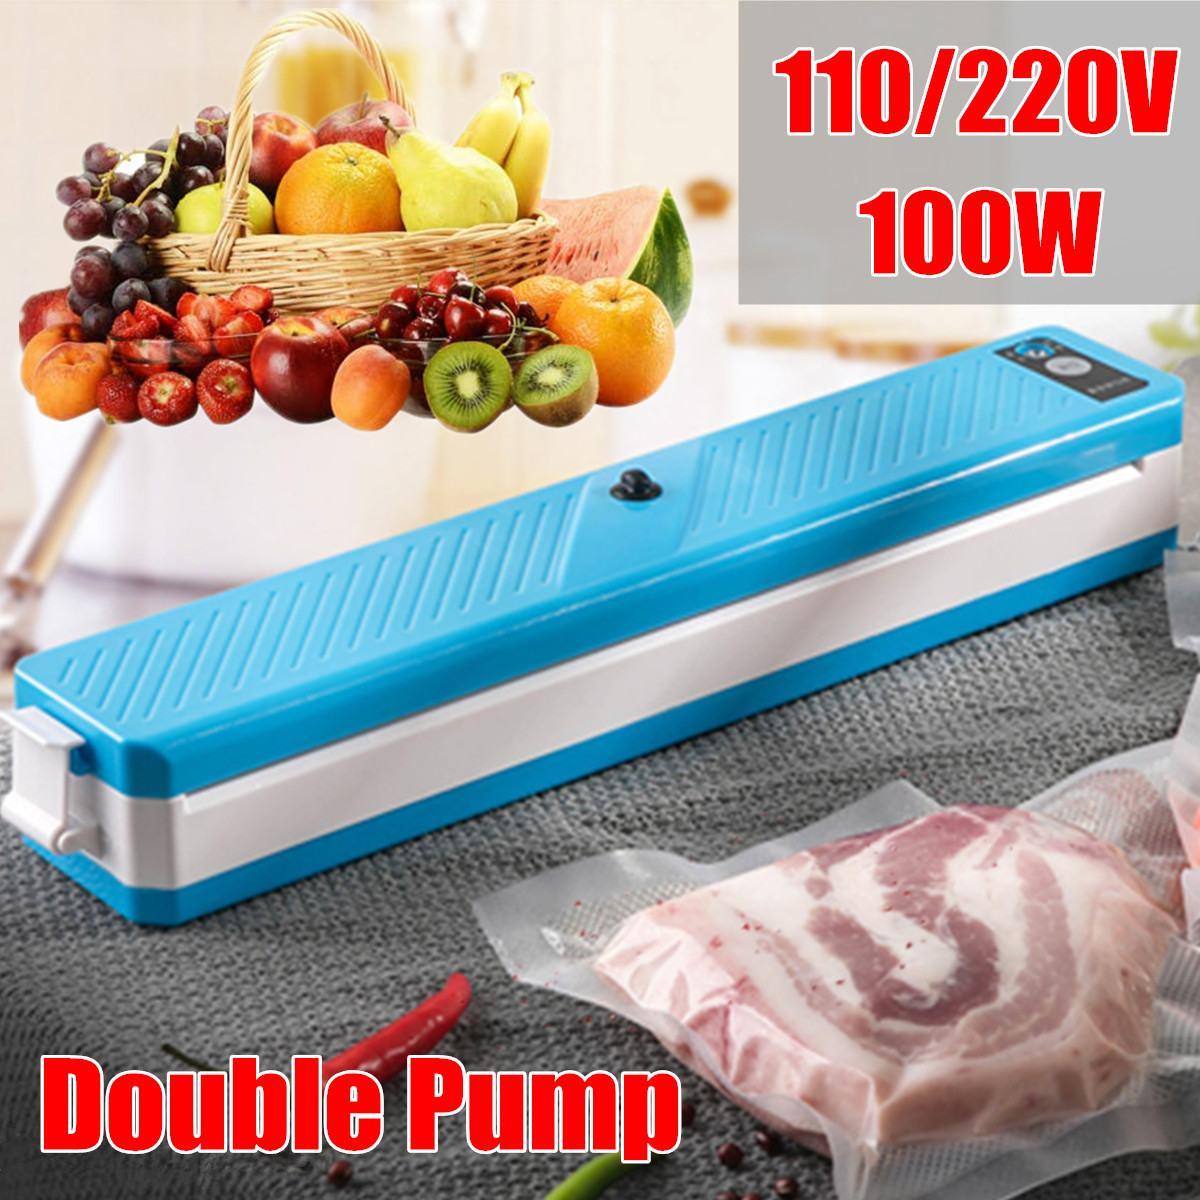 Electric Food Vacuum Sealer Packaging Machine 220V/110V Vaccum Food Sealing Packer For Kitchen Vacuum Food Plastic Storage Bags